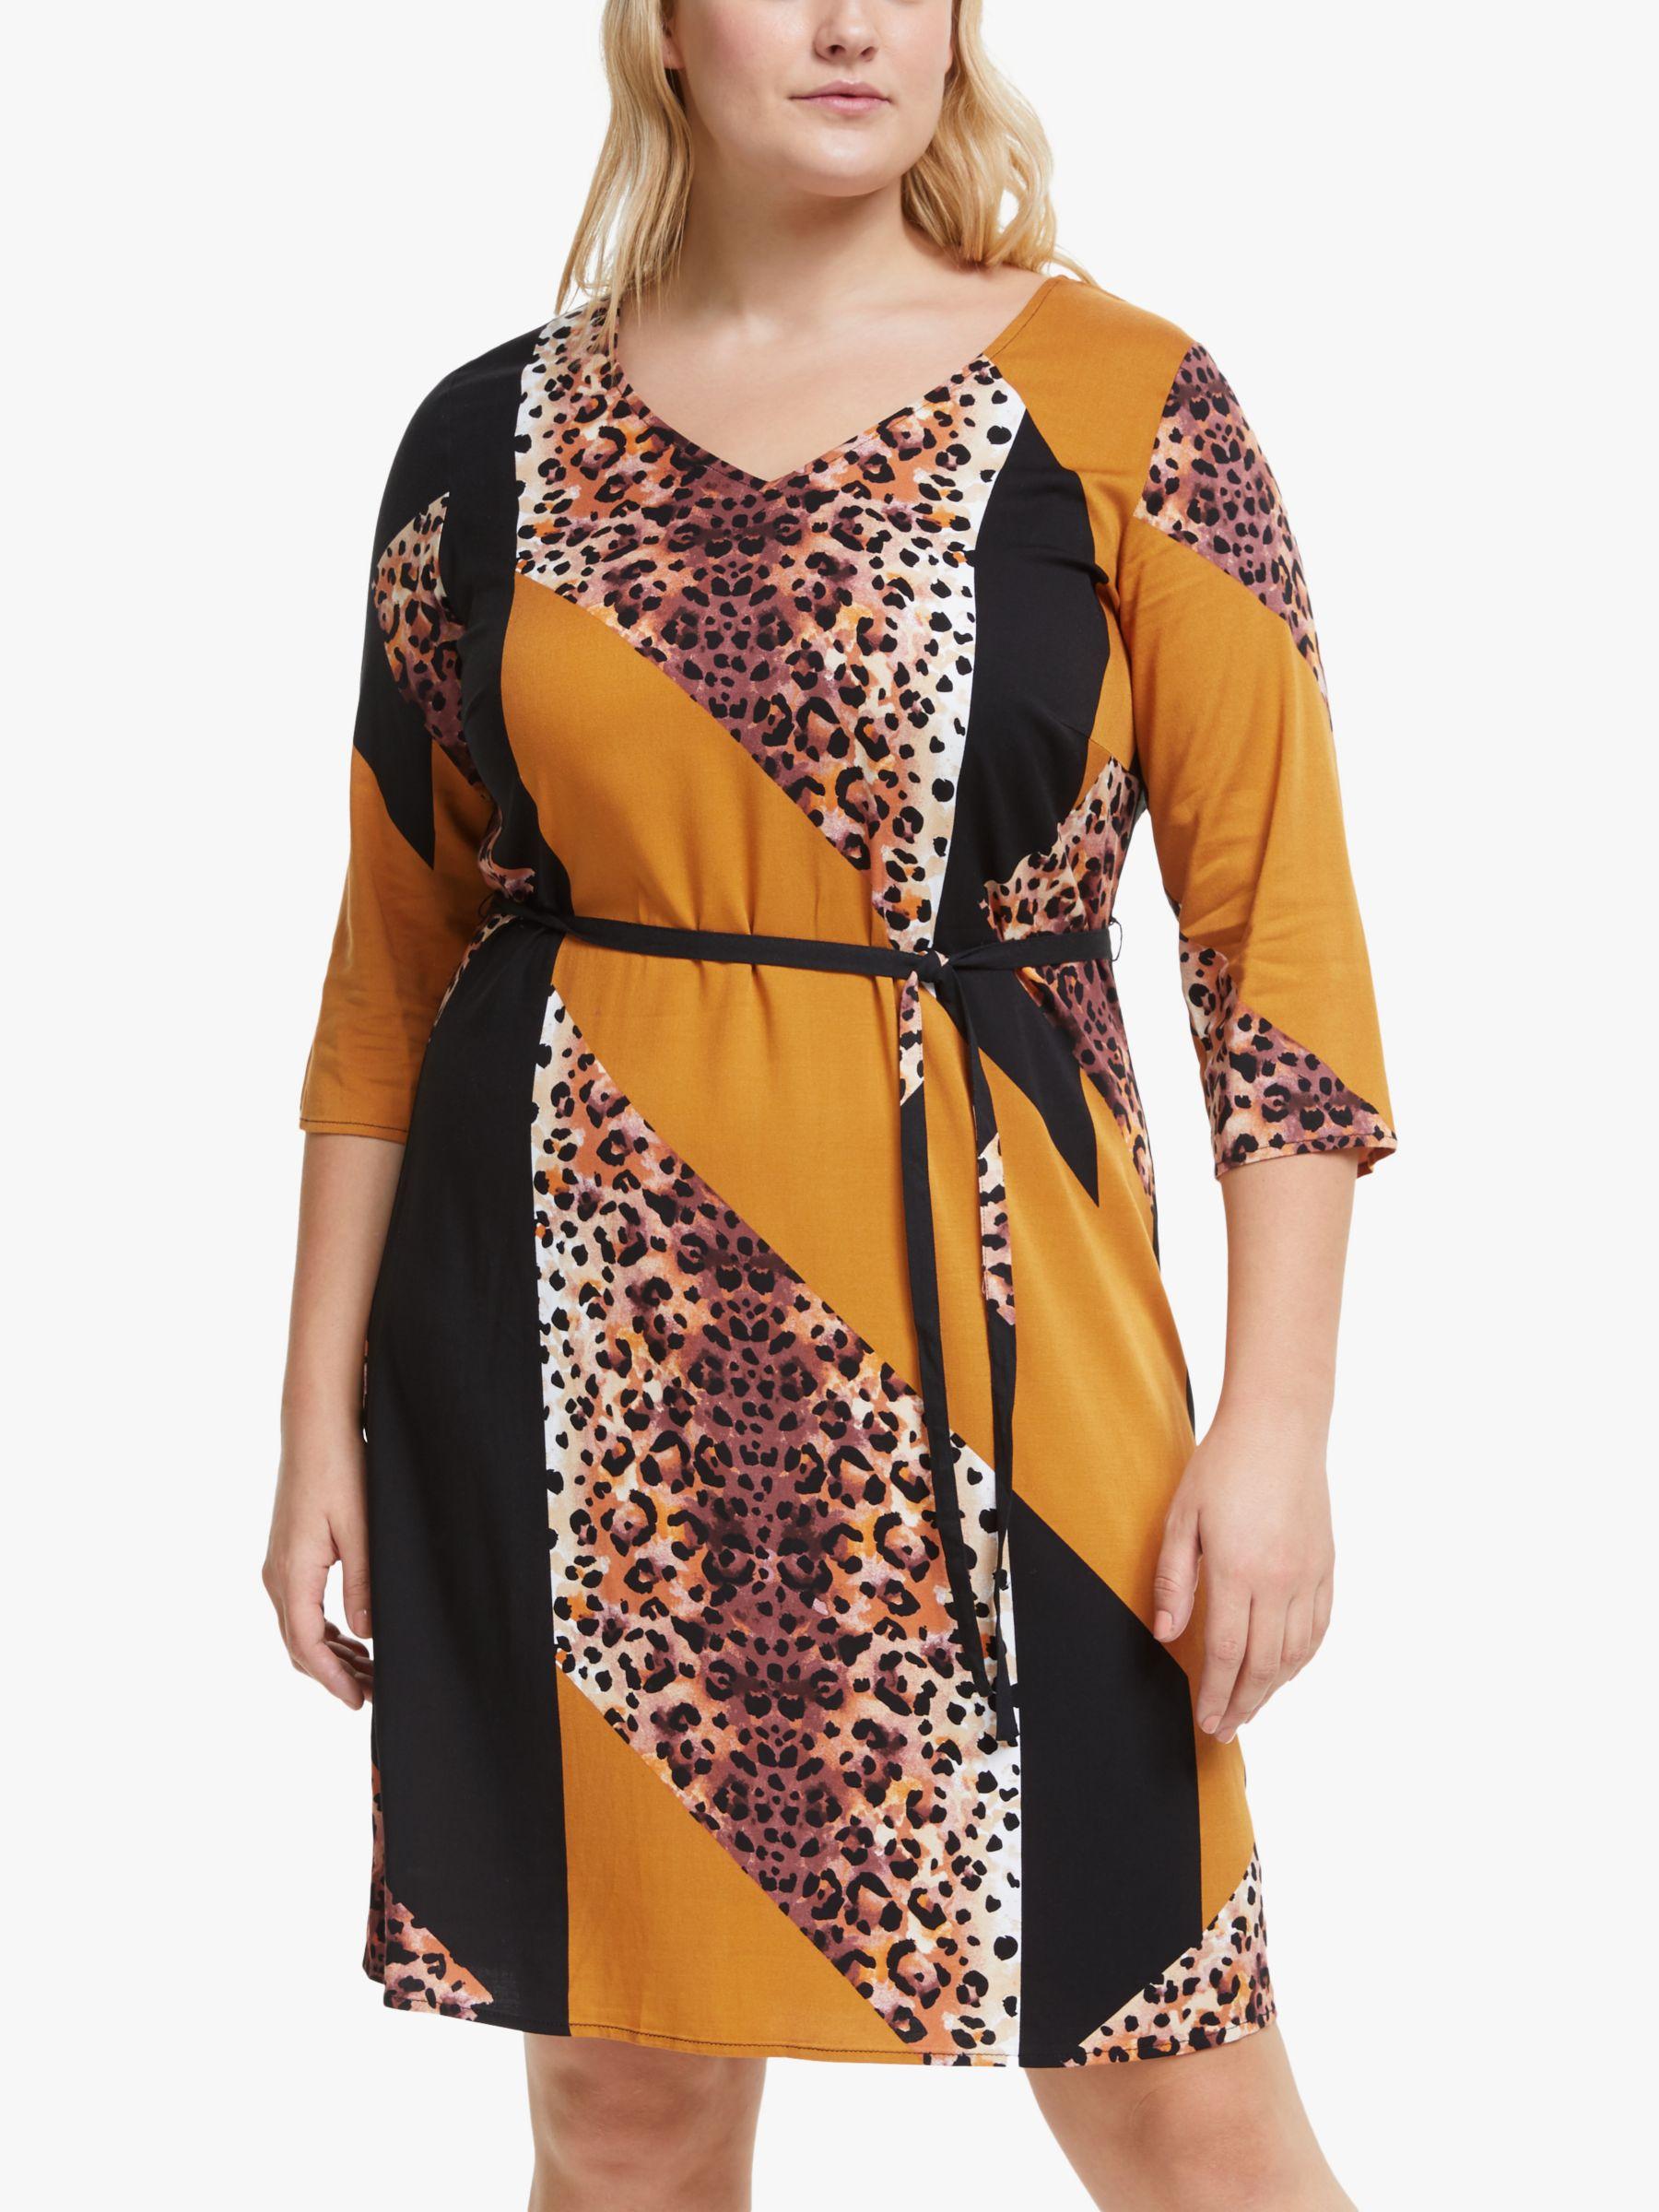 Junarose JUNAROSE Curve Koikeenan Print Mini Dress, Black